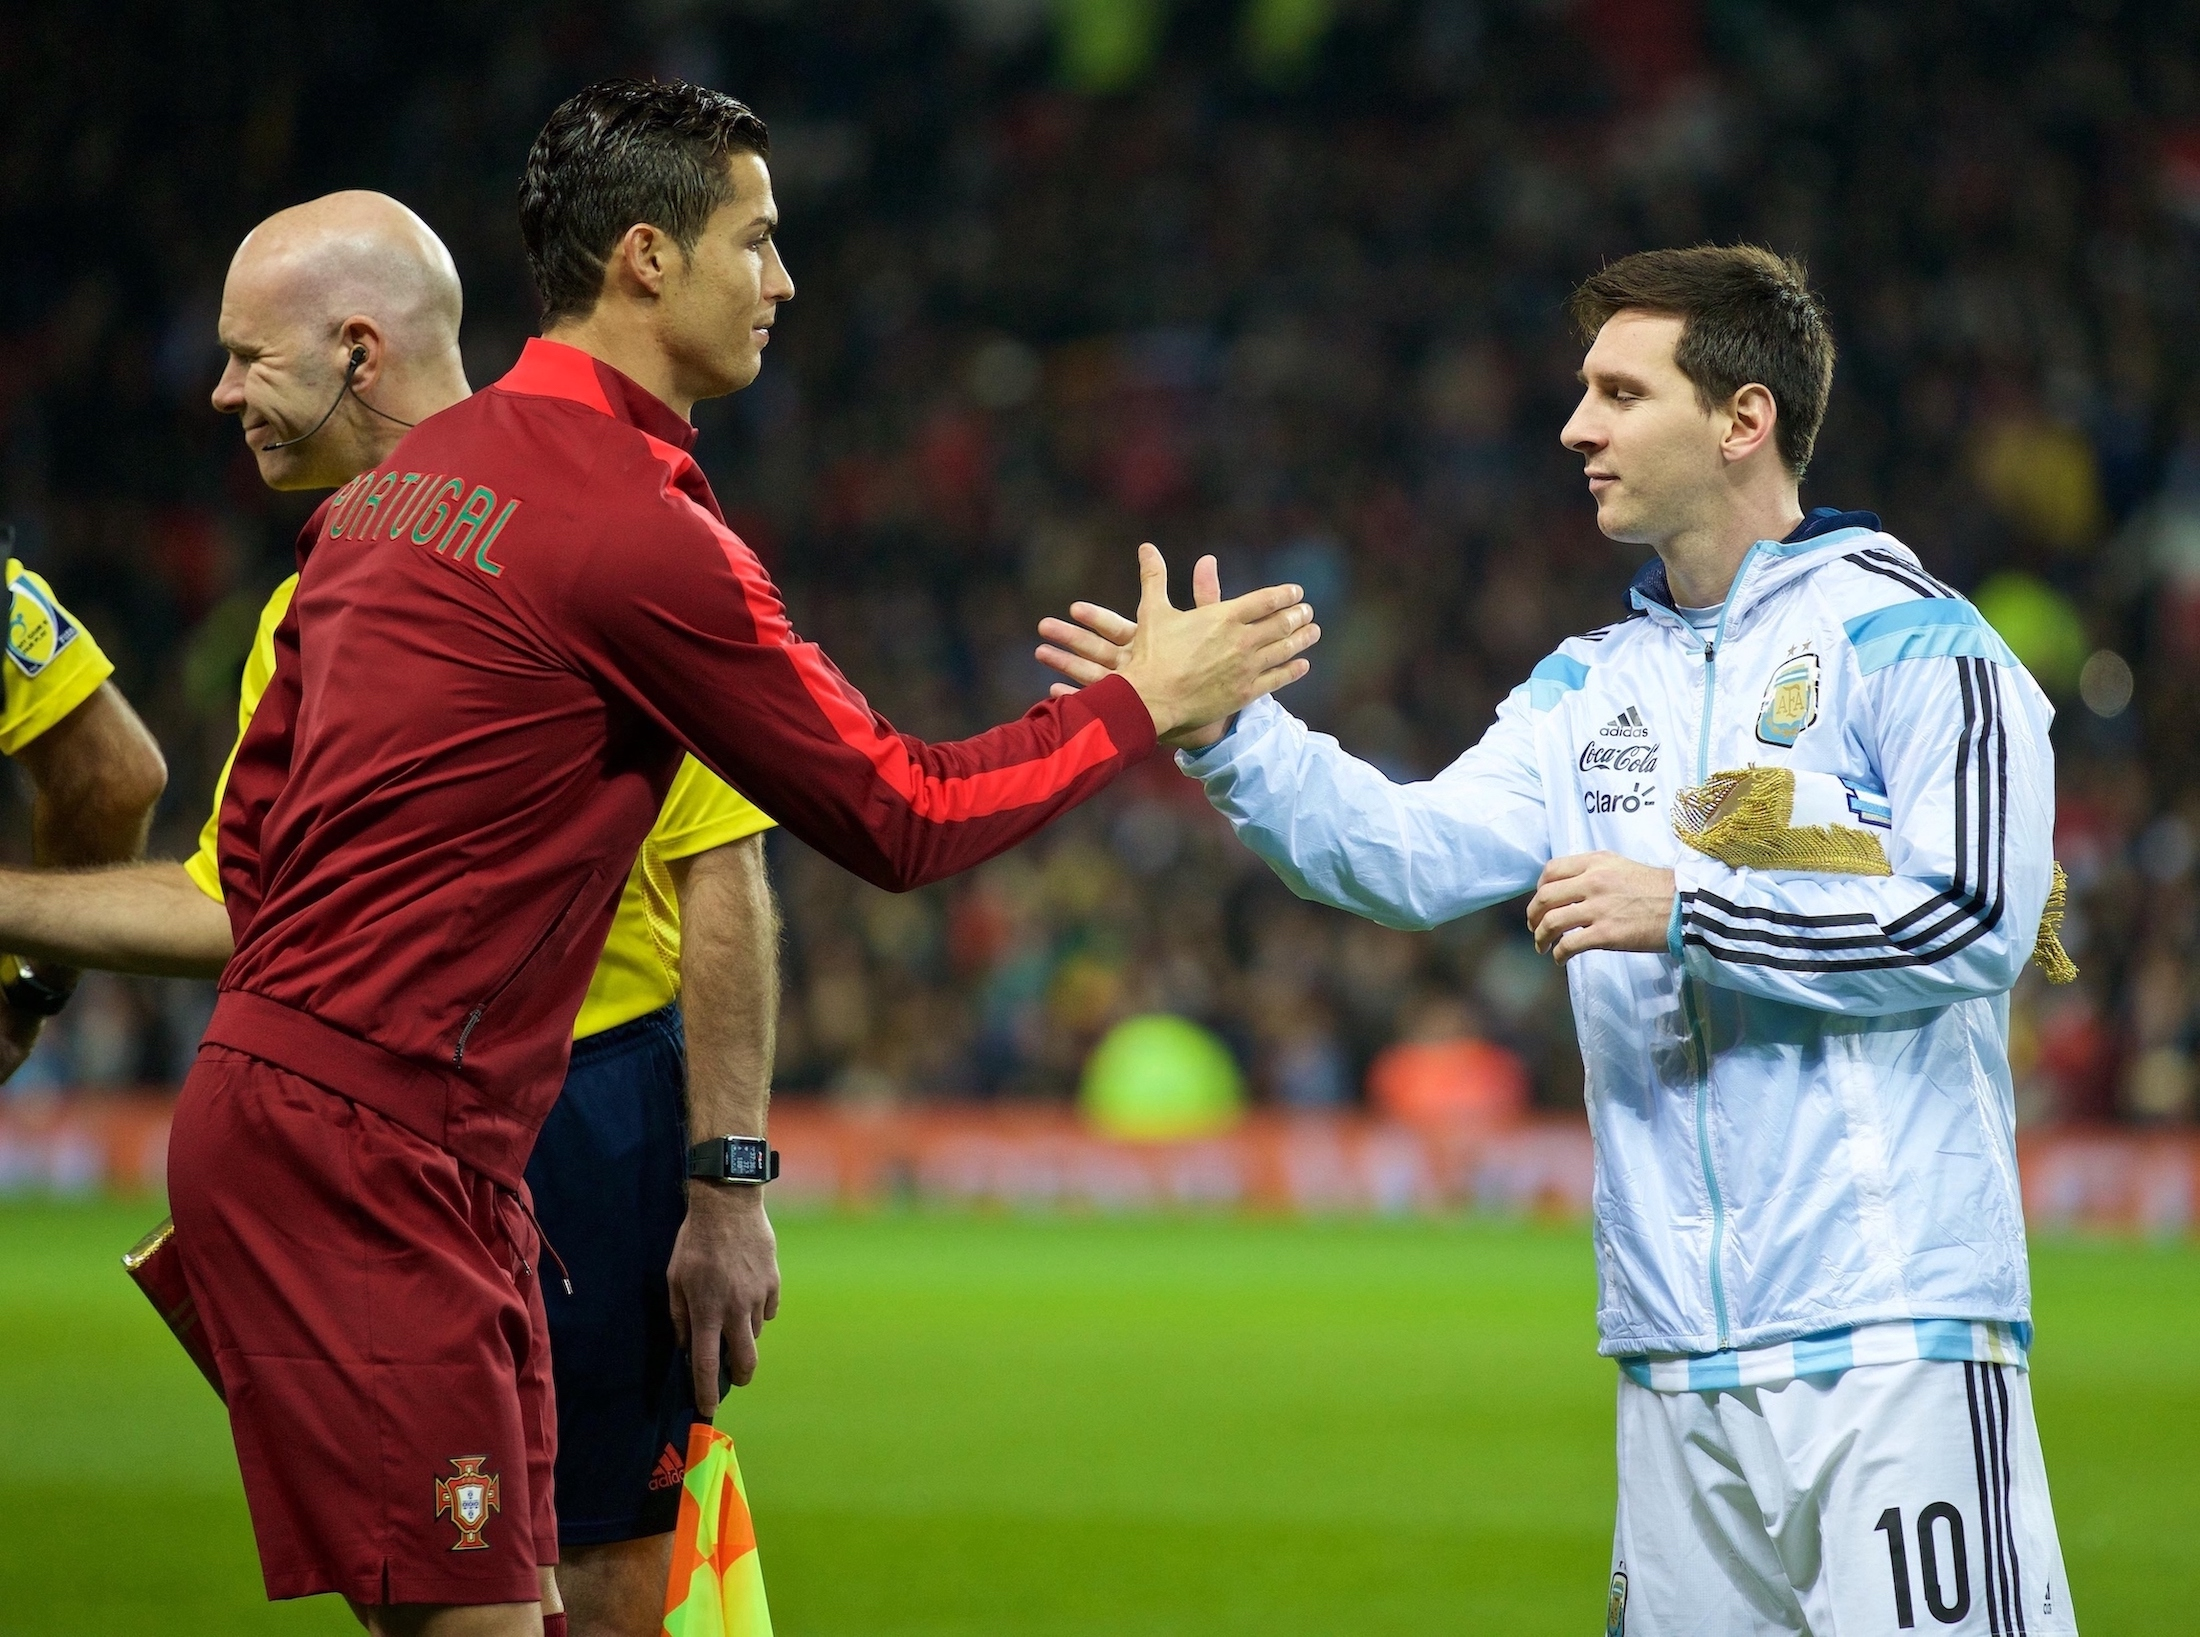 RMC Sport rend hommage à Cristiano Ronaldo et Lionel Messi